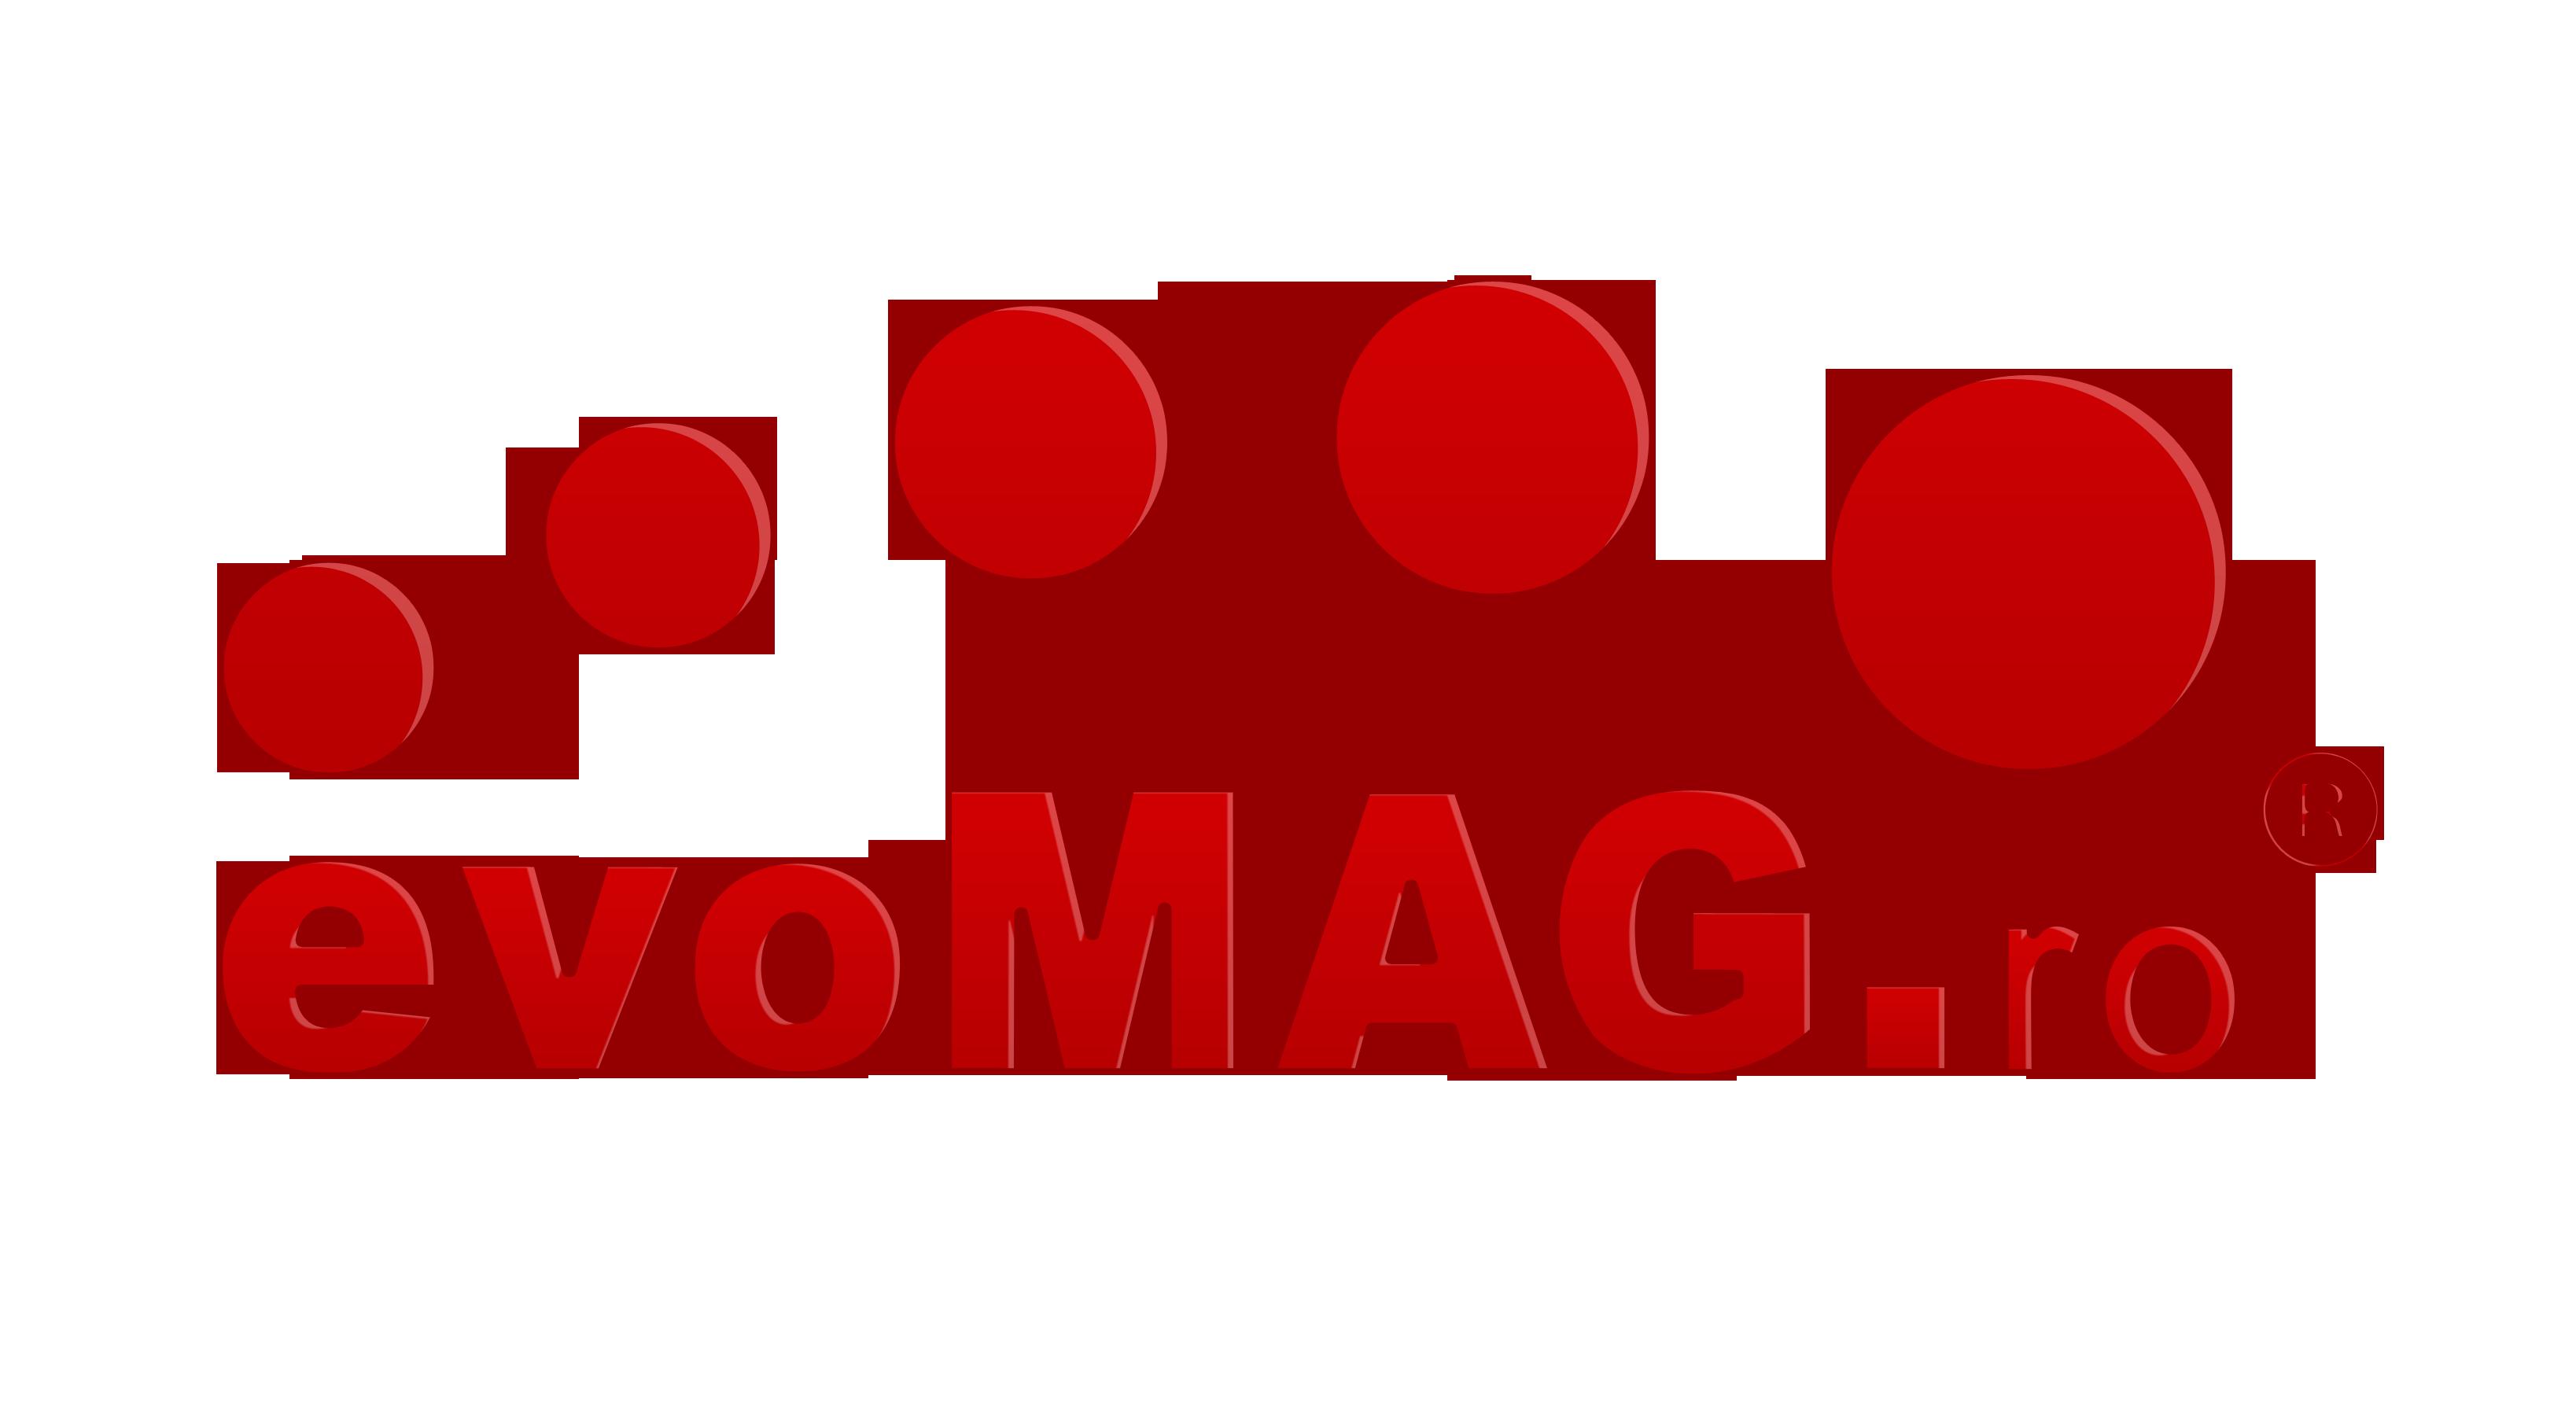 WWW.EVOMAG.RO